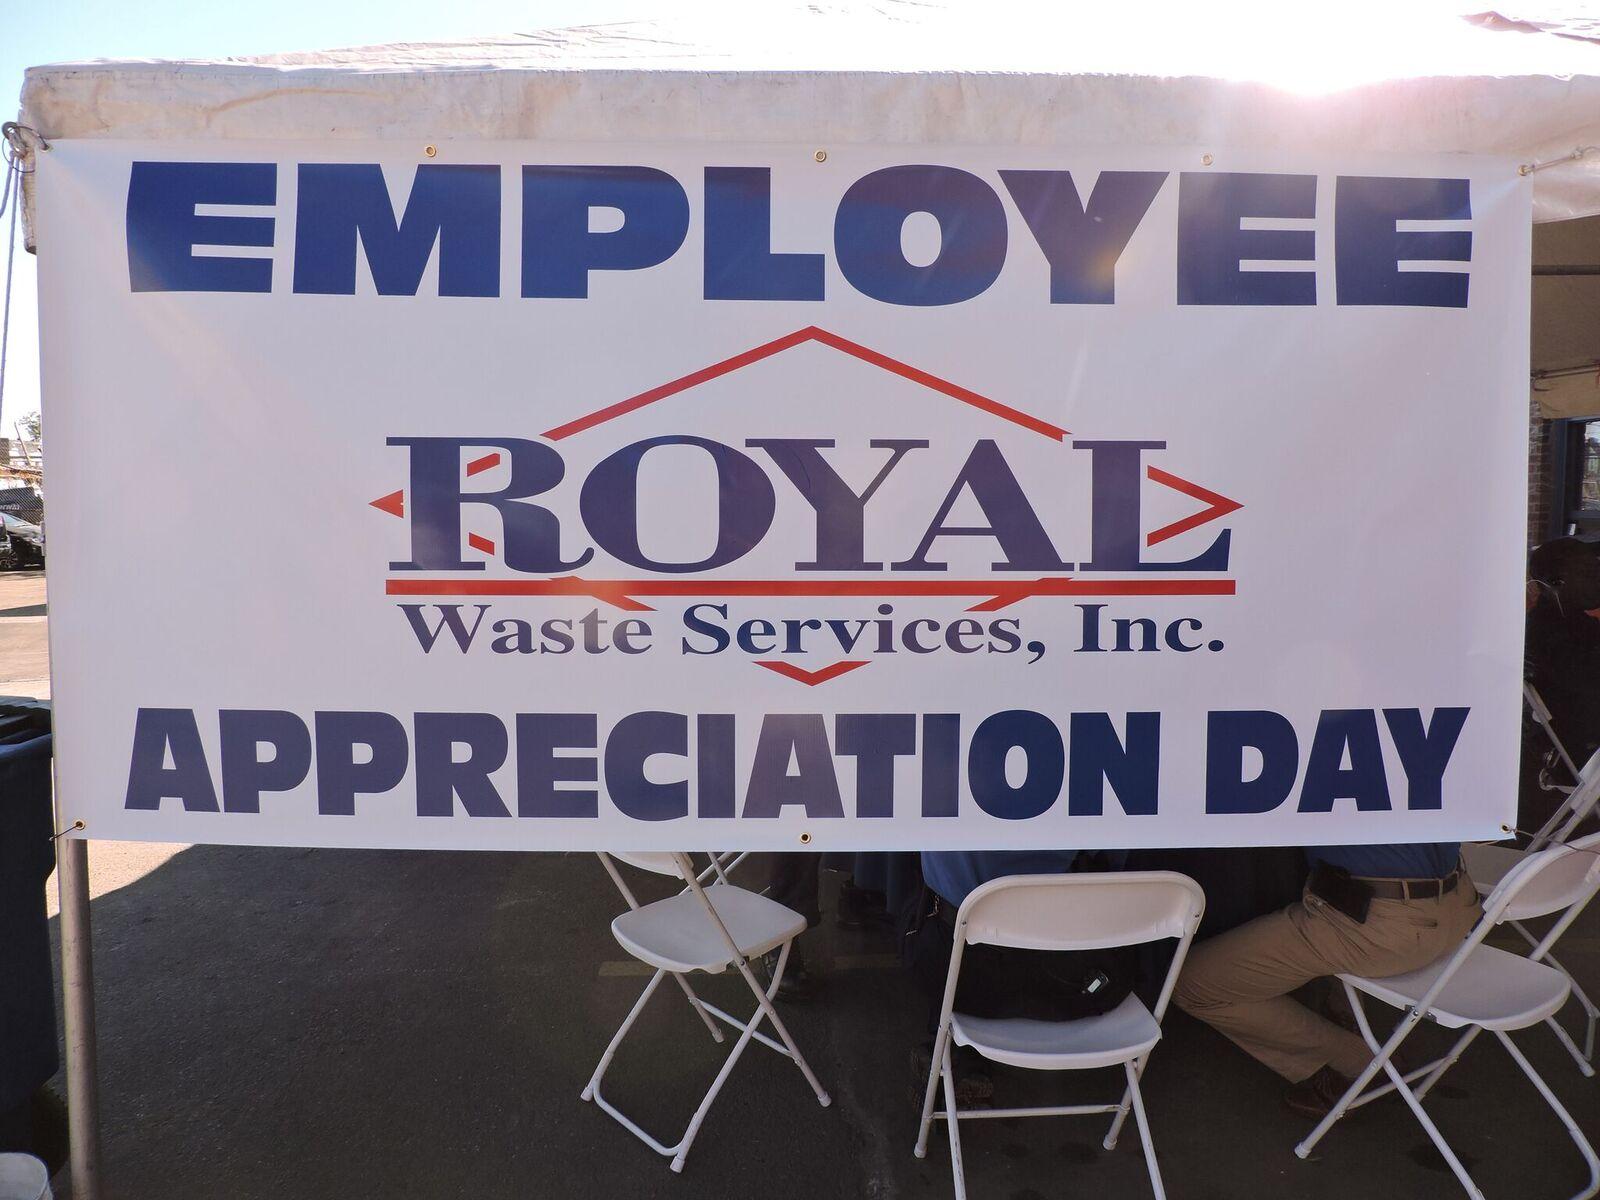 Employee Appreciation Day 2019 - Calendar Date. When is Employee Appreciation Day 2019?